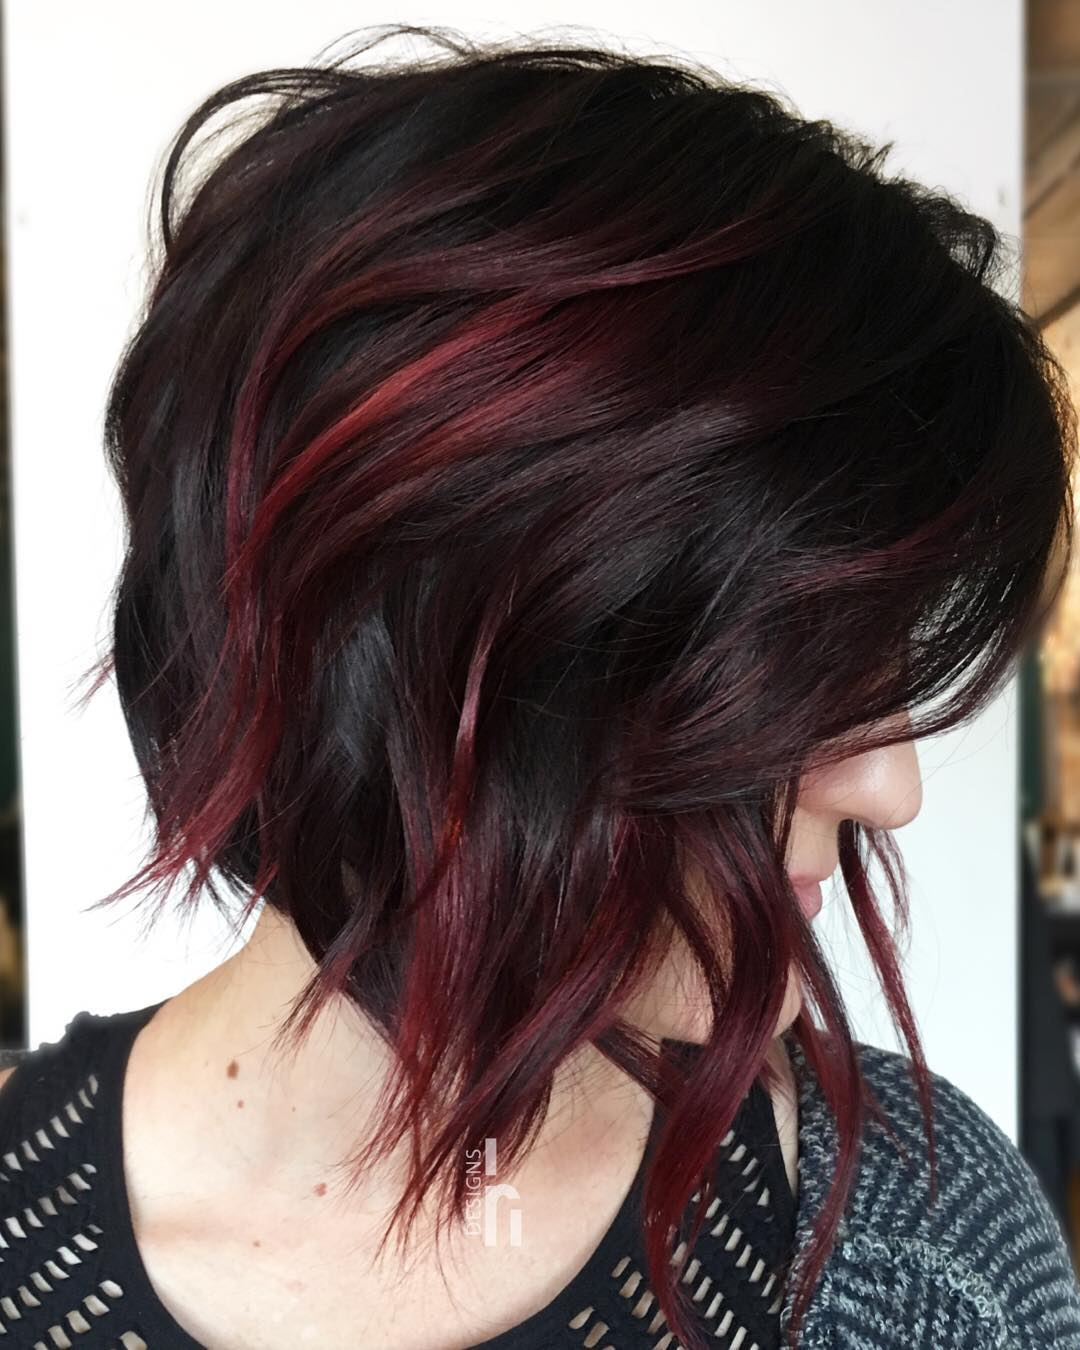 10 Stylish Medium Bob Haircuts For Women Easy Care Chic